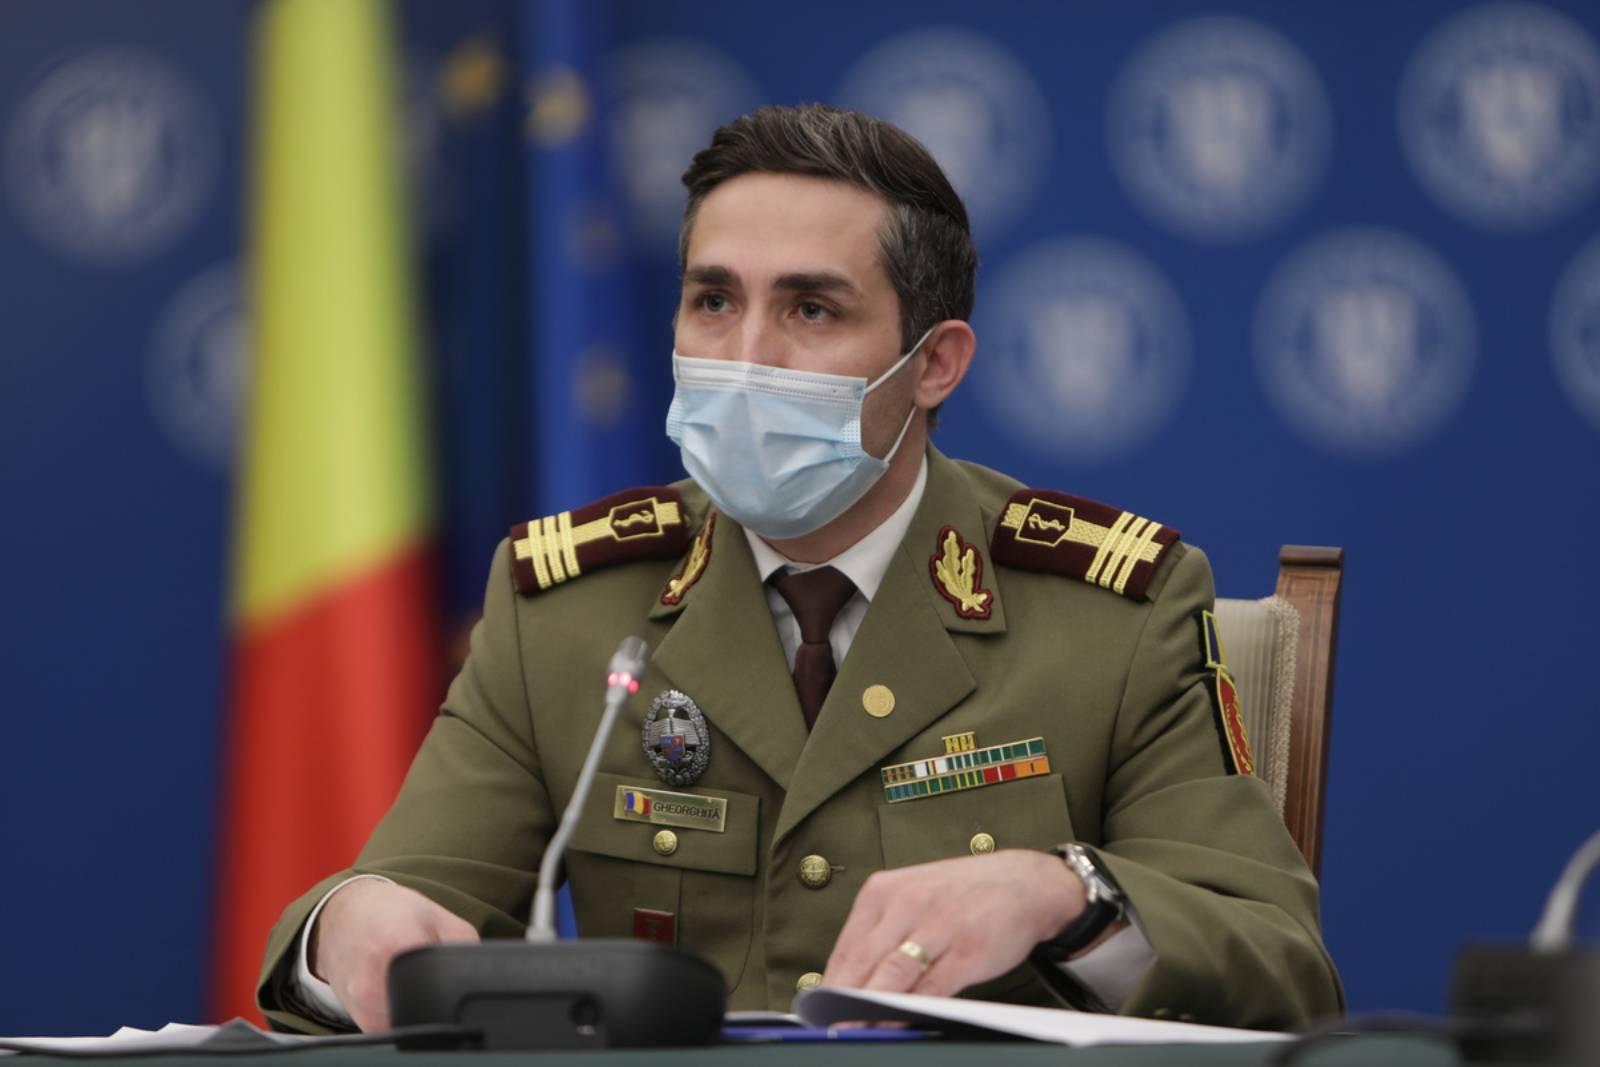 Valeriu Gheorghita Procentul Imunizare Impotriva COVID-19 Romania